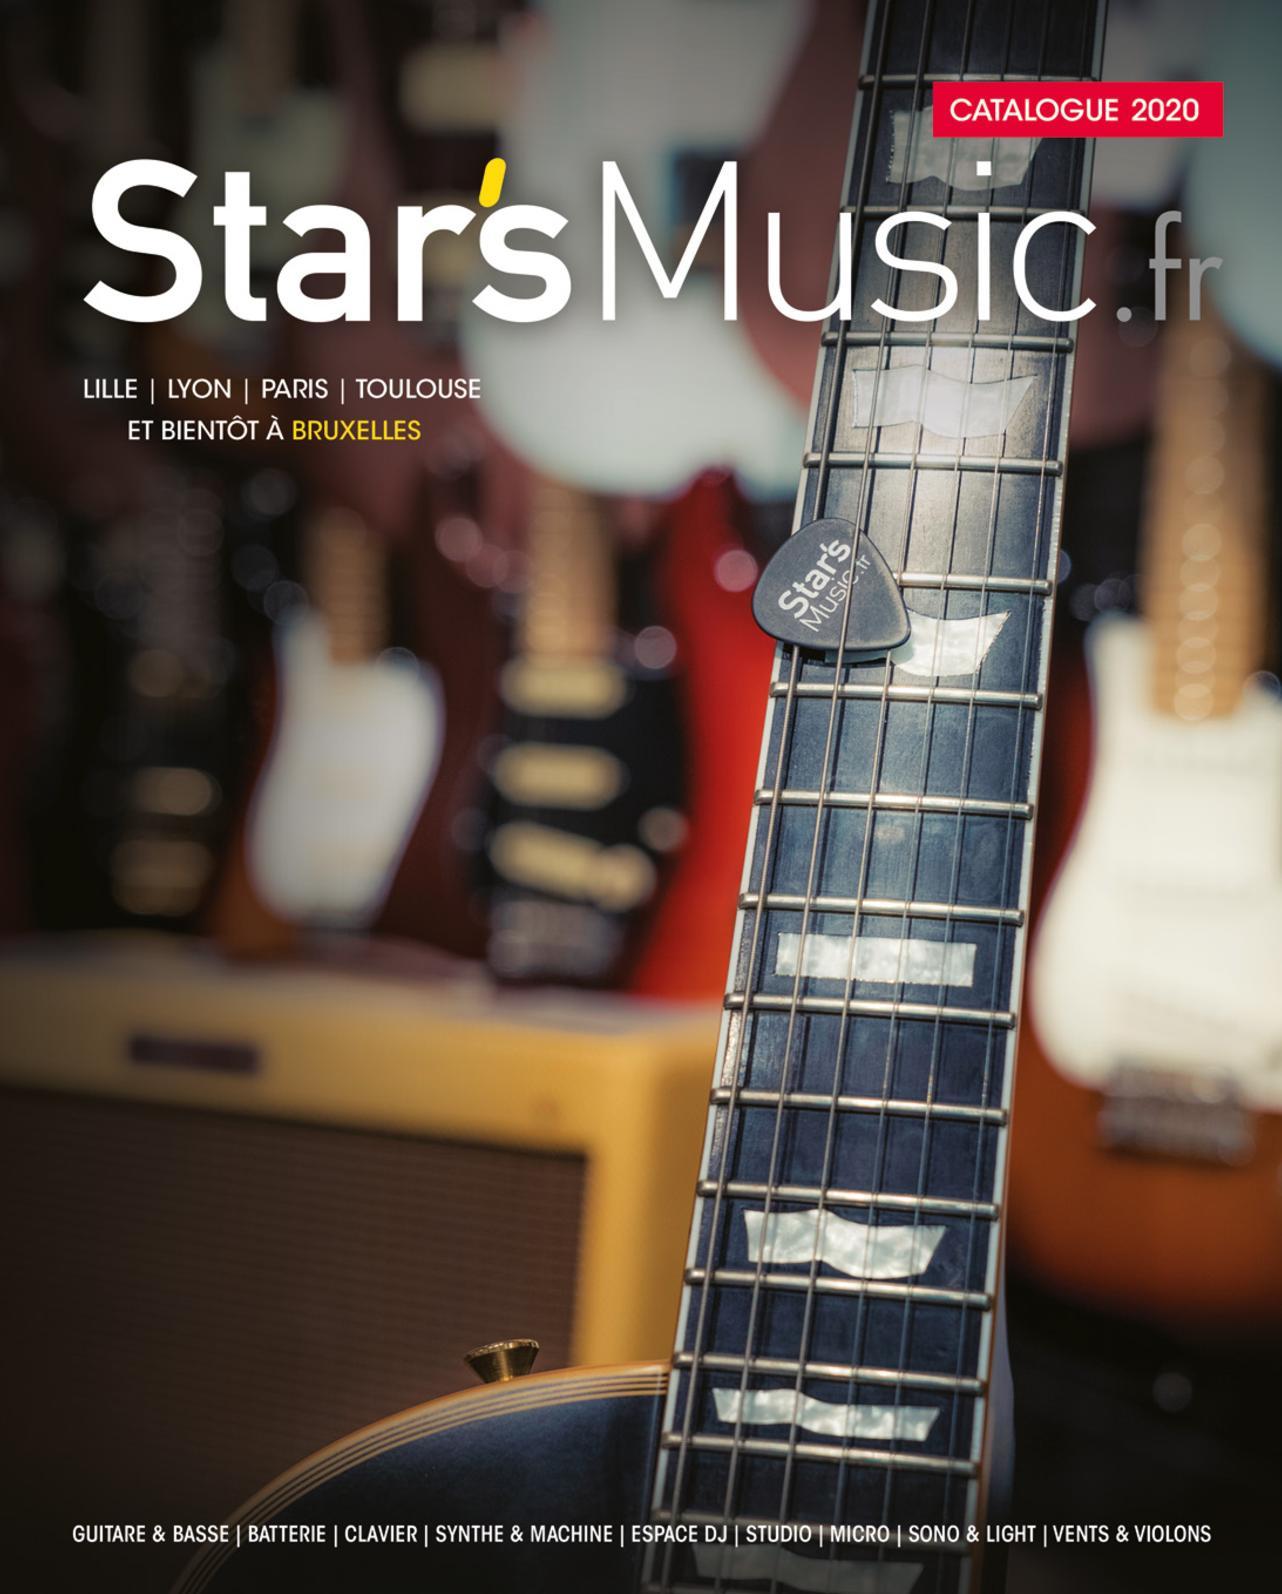 JEU DE 2 MICROS Accessoires guitare Micro et pr/éamp guitare Micro guitare /électrique FENDER MICROS ORIGINAL VINTAGE TELE 52